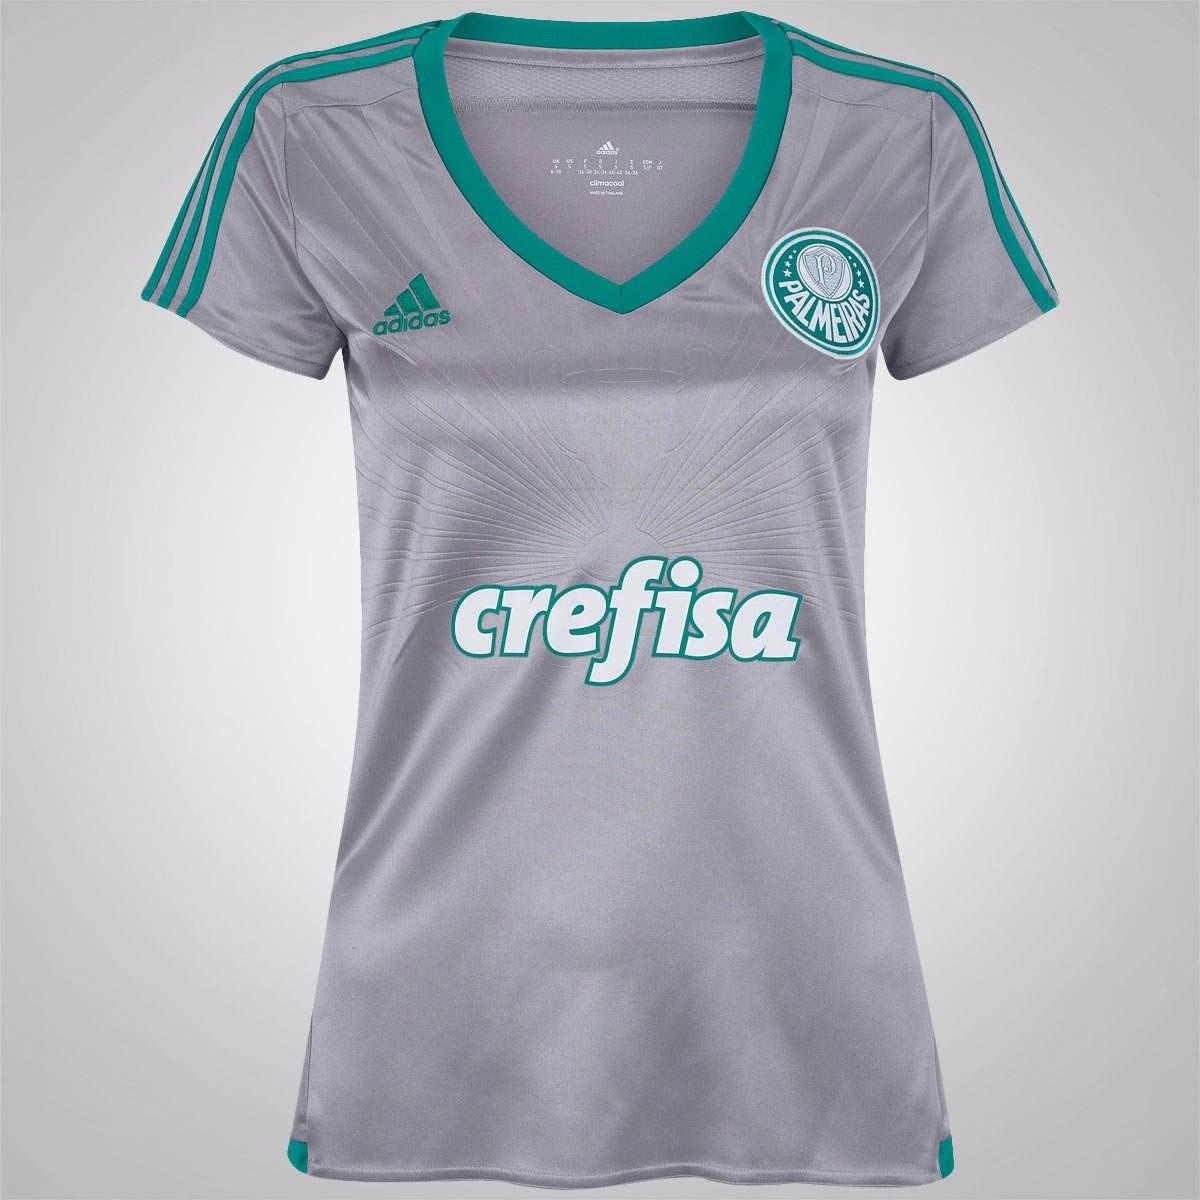 4994ef0a288 Camisa Palmeiras adidas Iii - 2015   2016 S nº - Feminina - R  157 ...